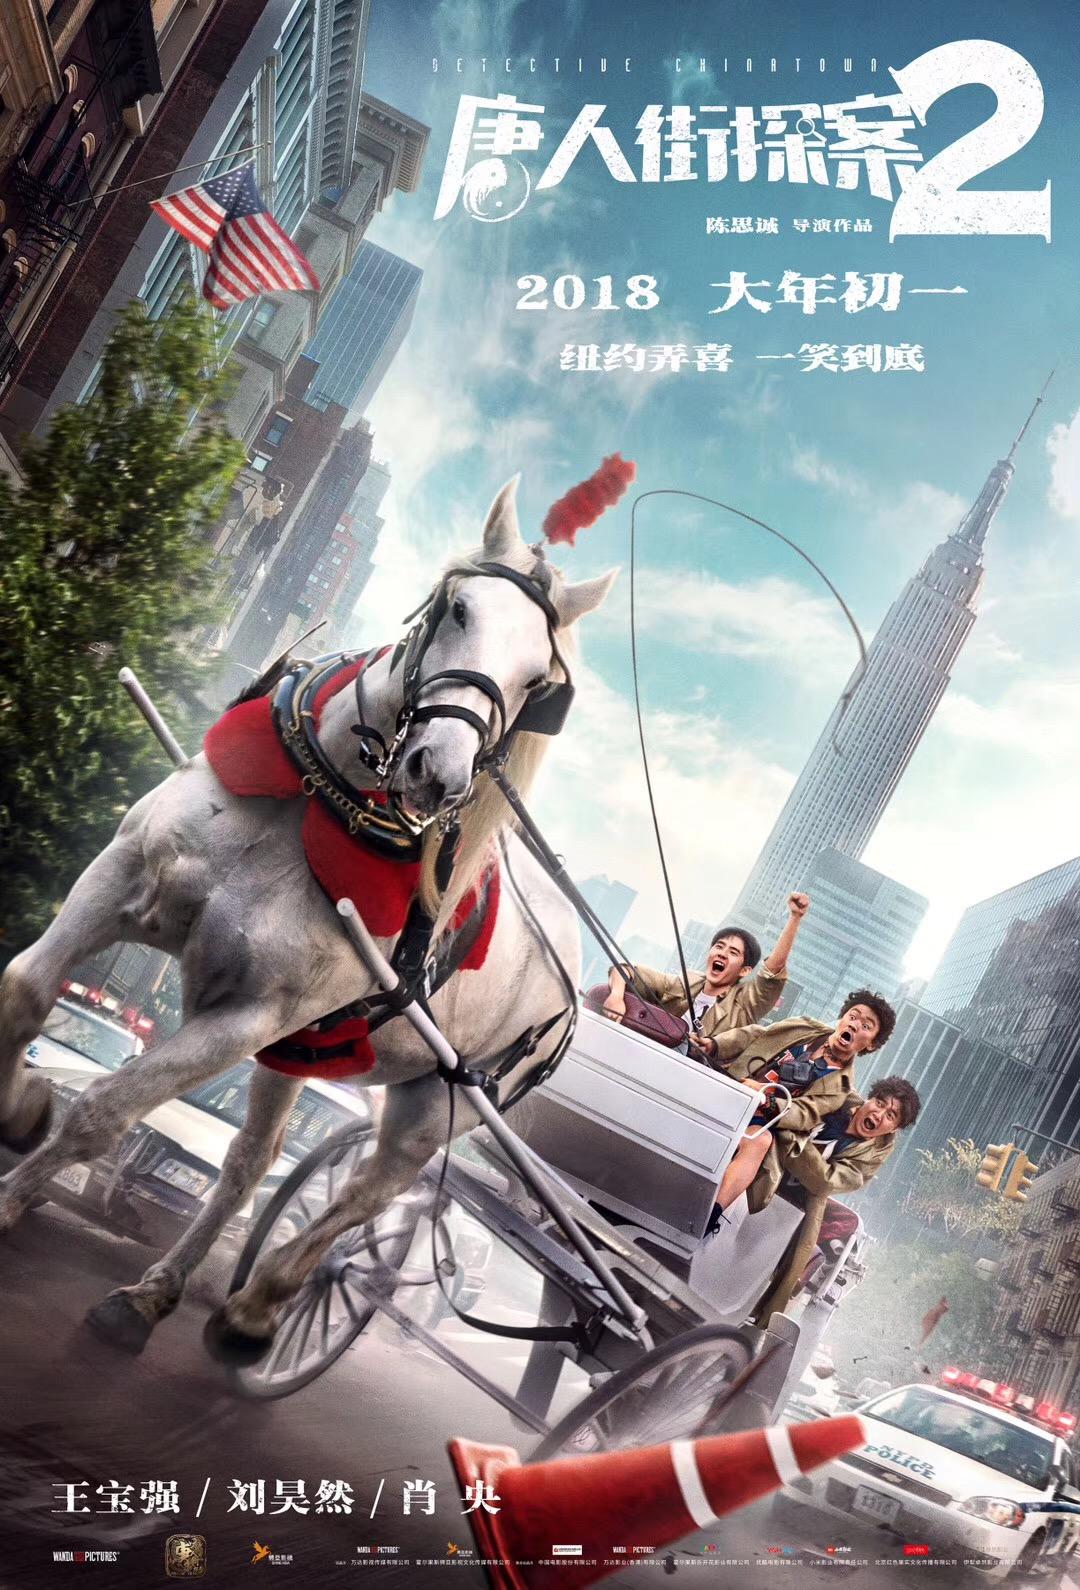 Detective Chinatown 2 2018 Imdb